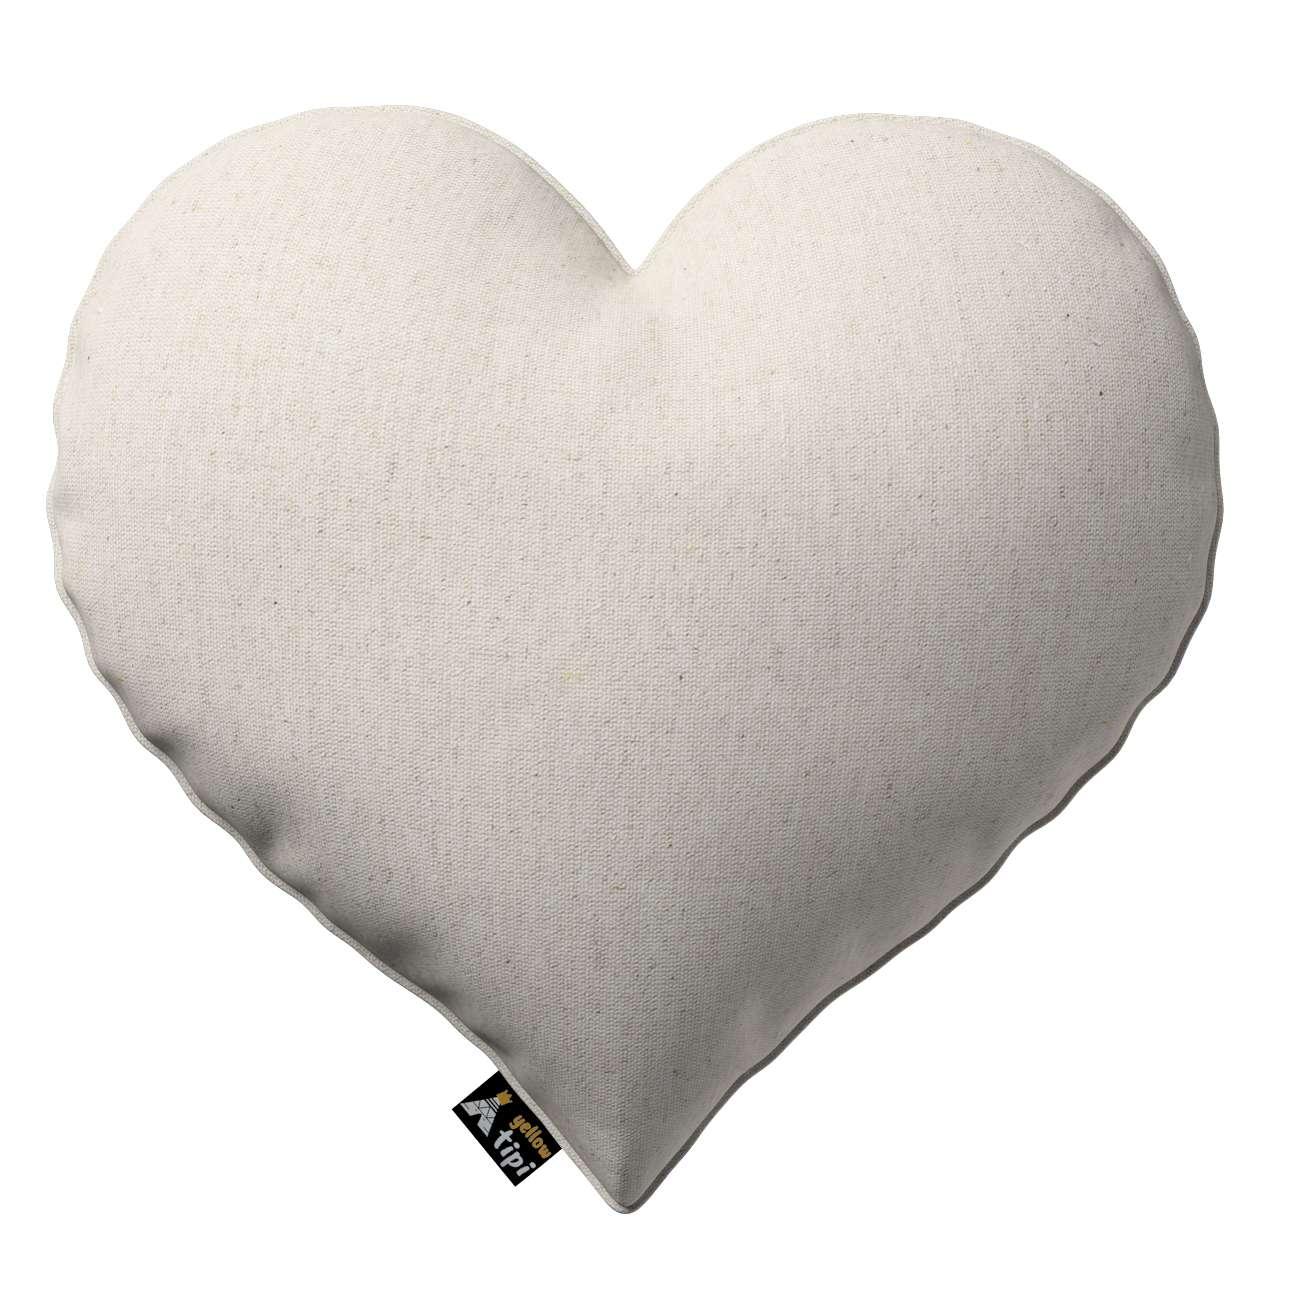 Heart of Love pagalvėlė kolekcijoje Happiness, audinys: 133-65